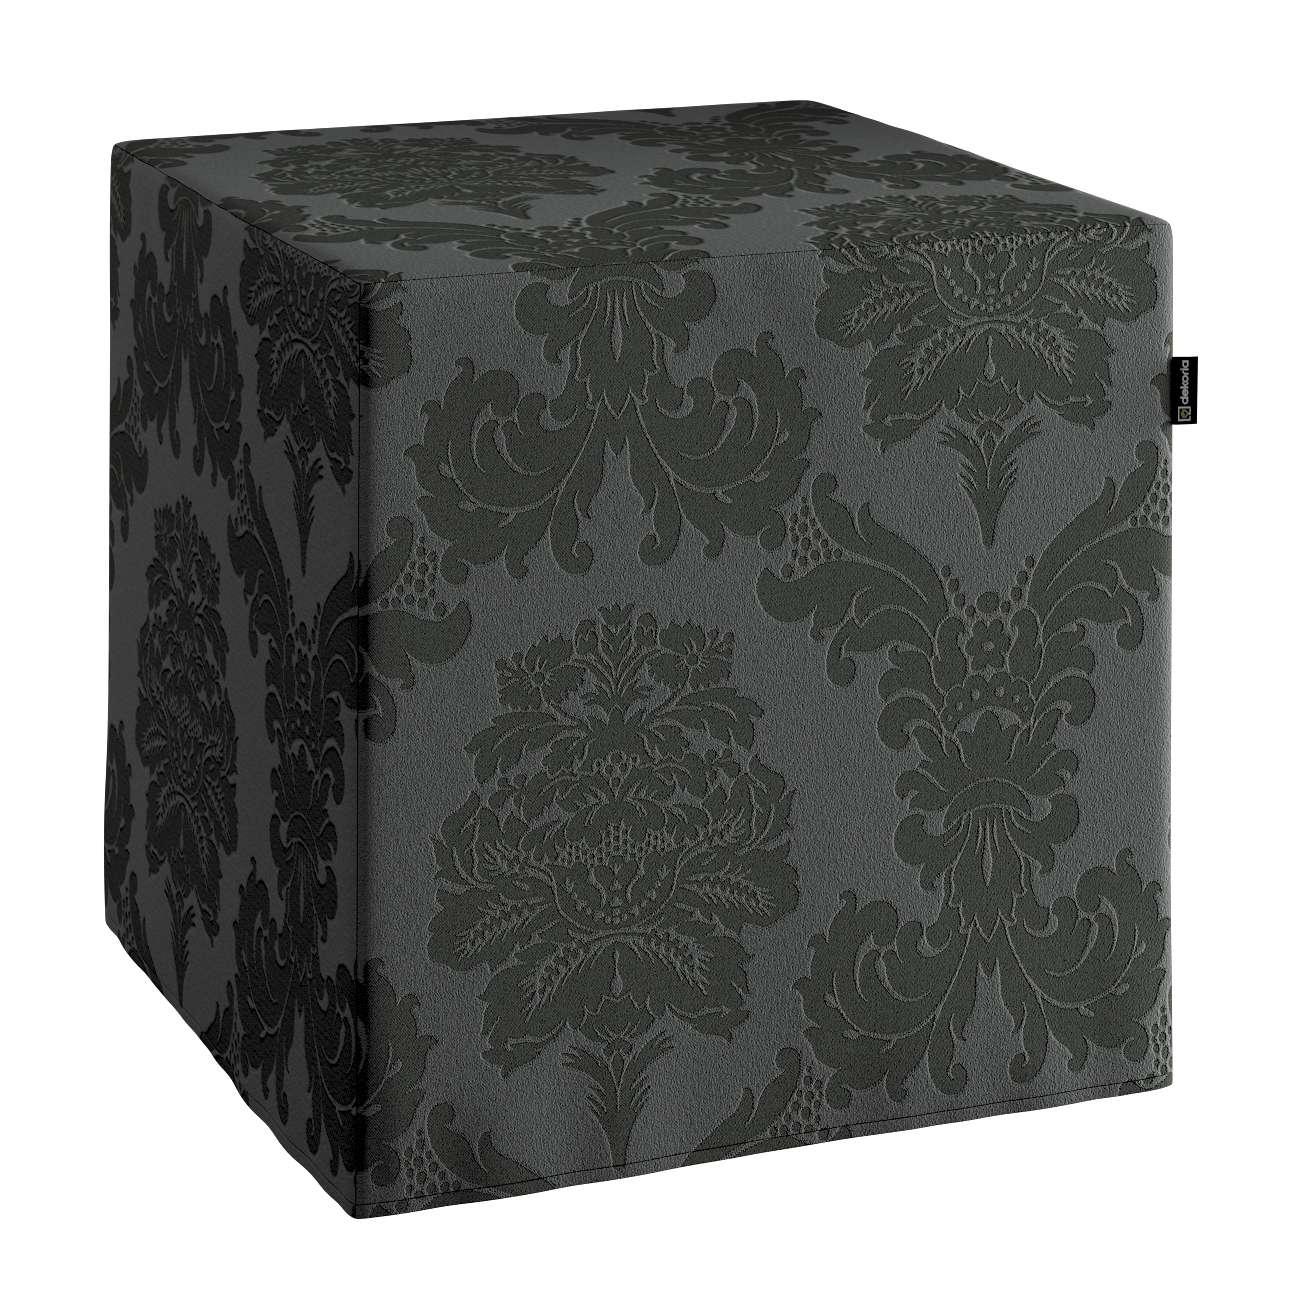 Sedák Cube - kostka pevná 40x40x40 v kolekci Damasco, látka: 613-32